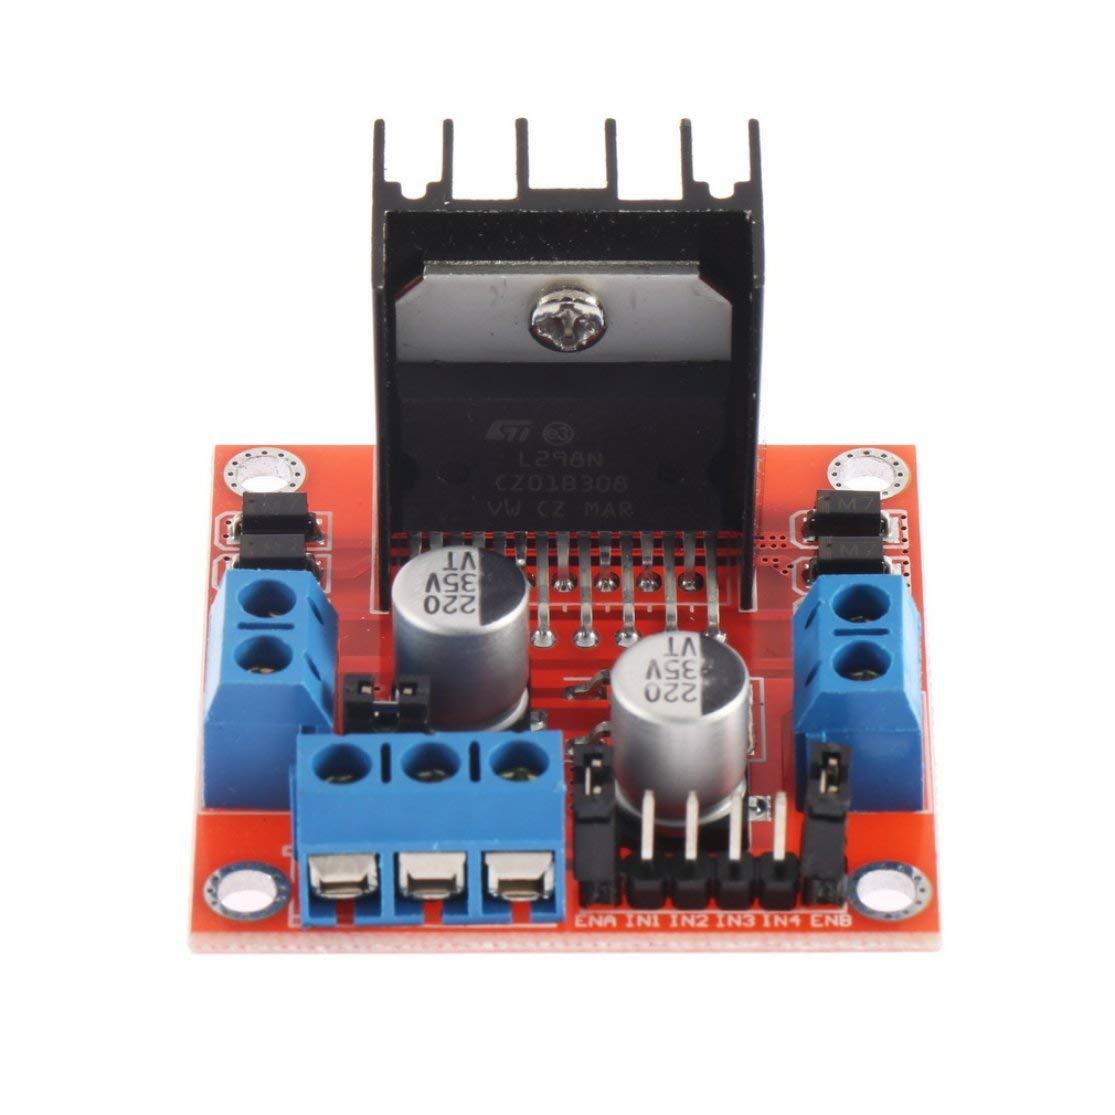 LouiseEvel215 Dual H Bridge Stepper Motor Drive m/ódulo de la Placa del Controlador para Arduino L298N Motor Driver Board Module